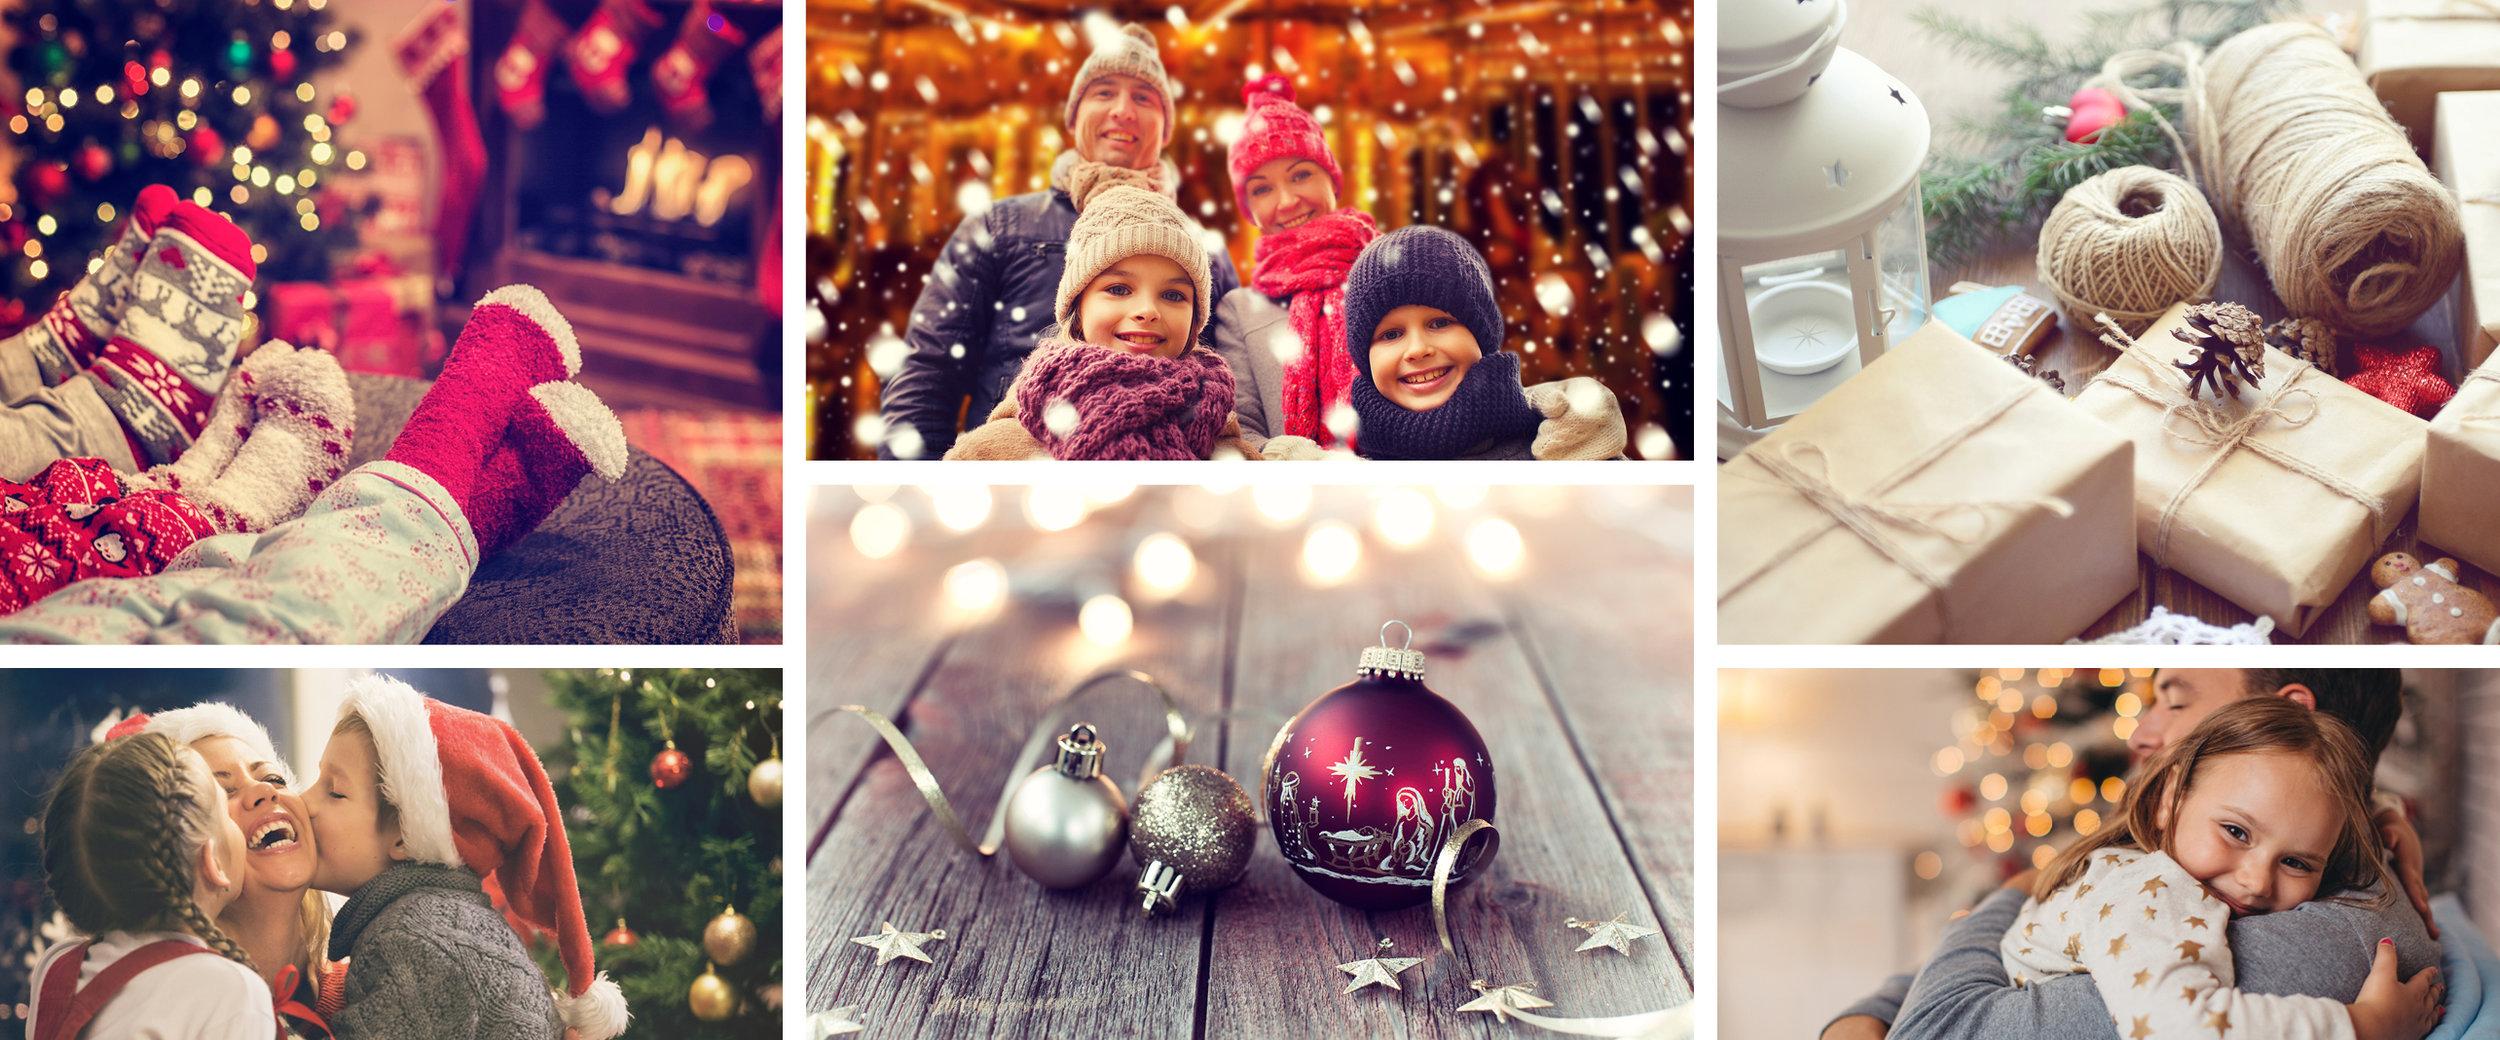 December-Newsletter-Image